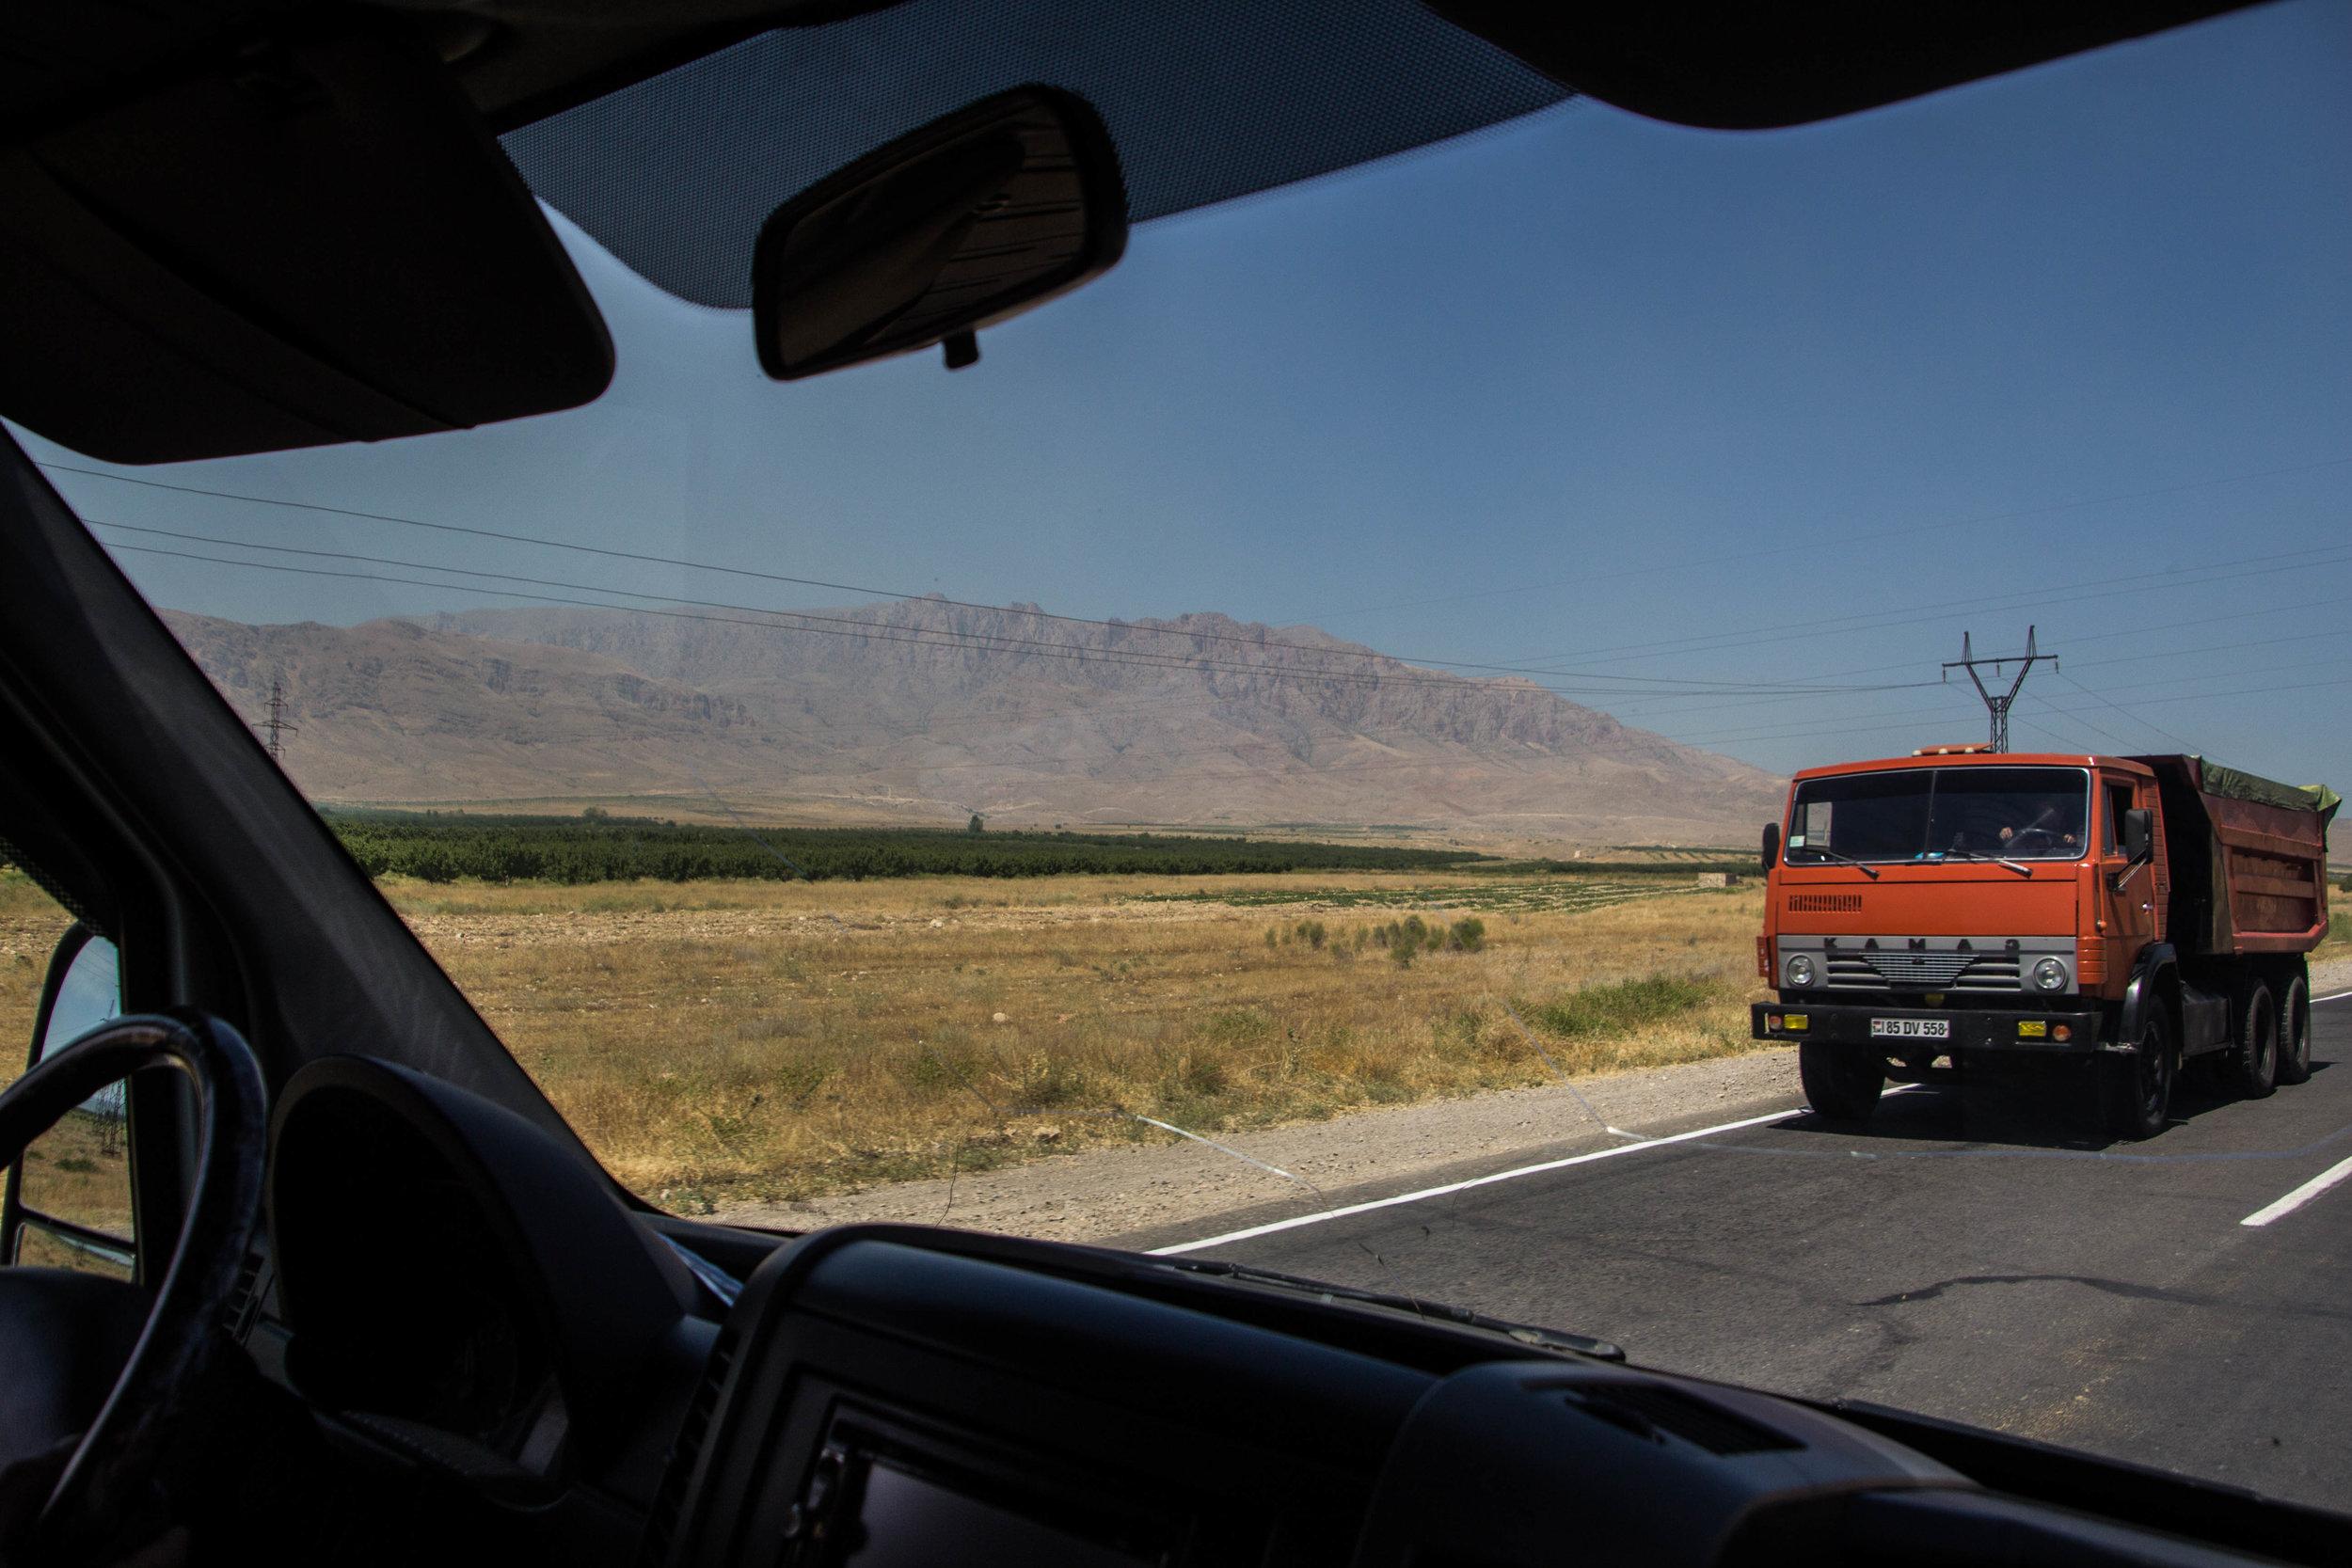 armenia-azerbaijan-southern-border-10.jpg